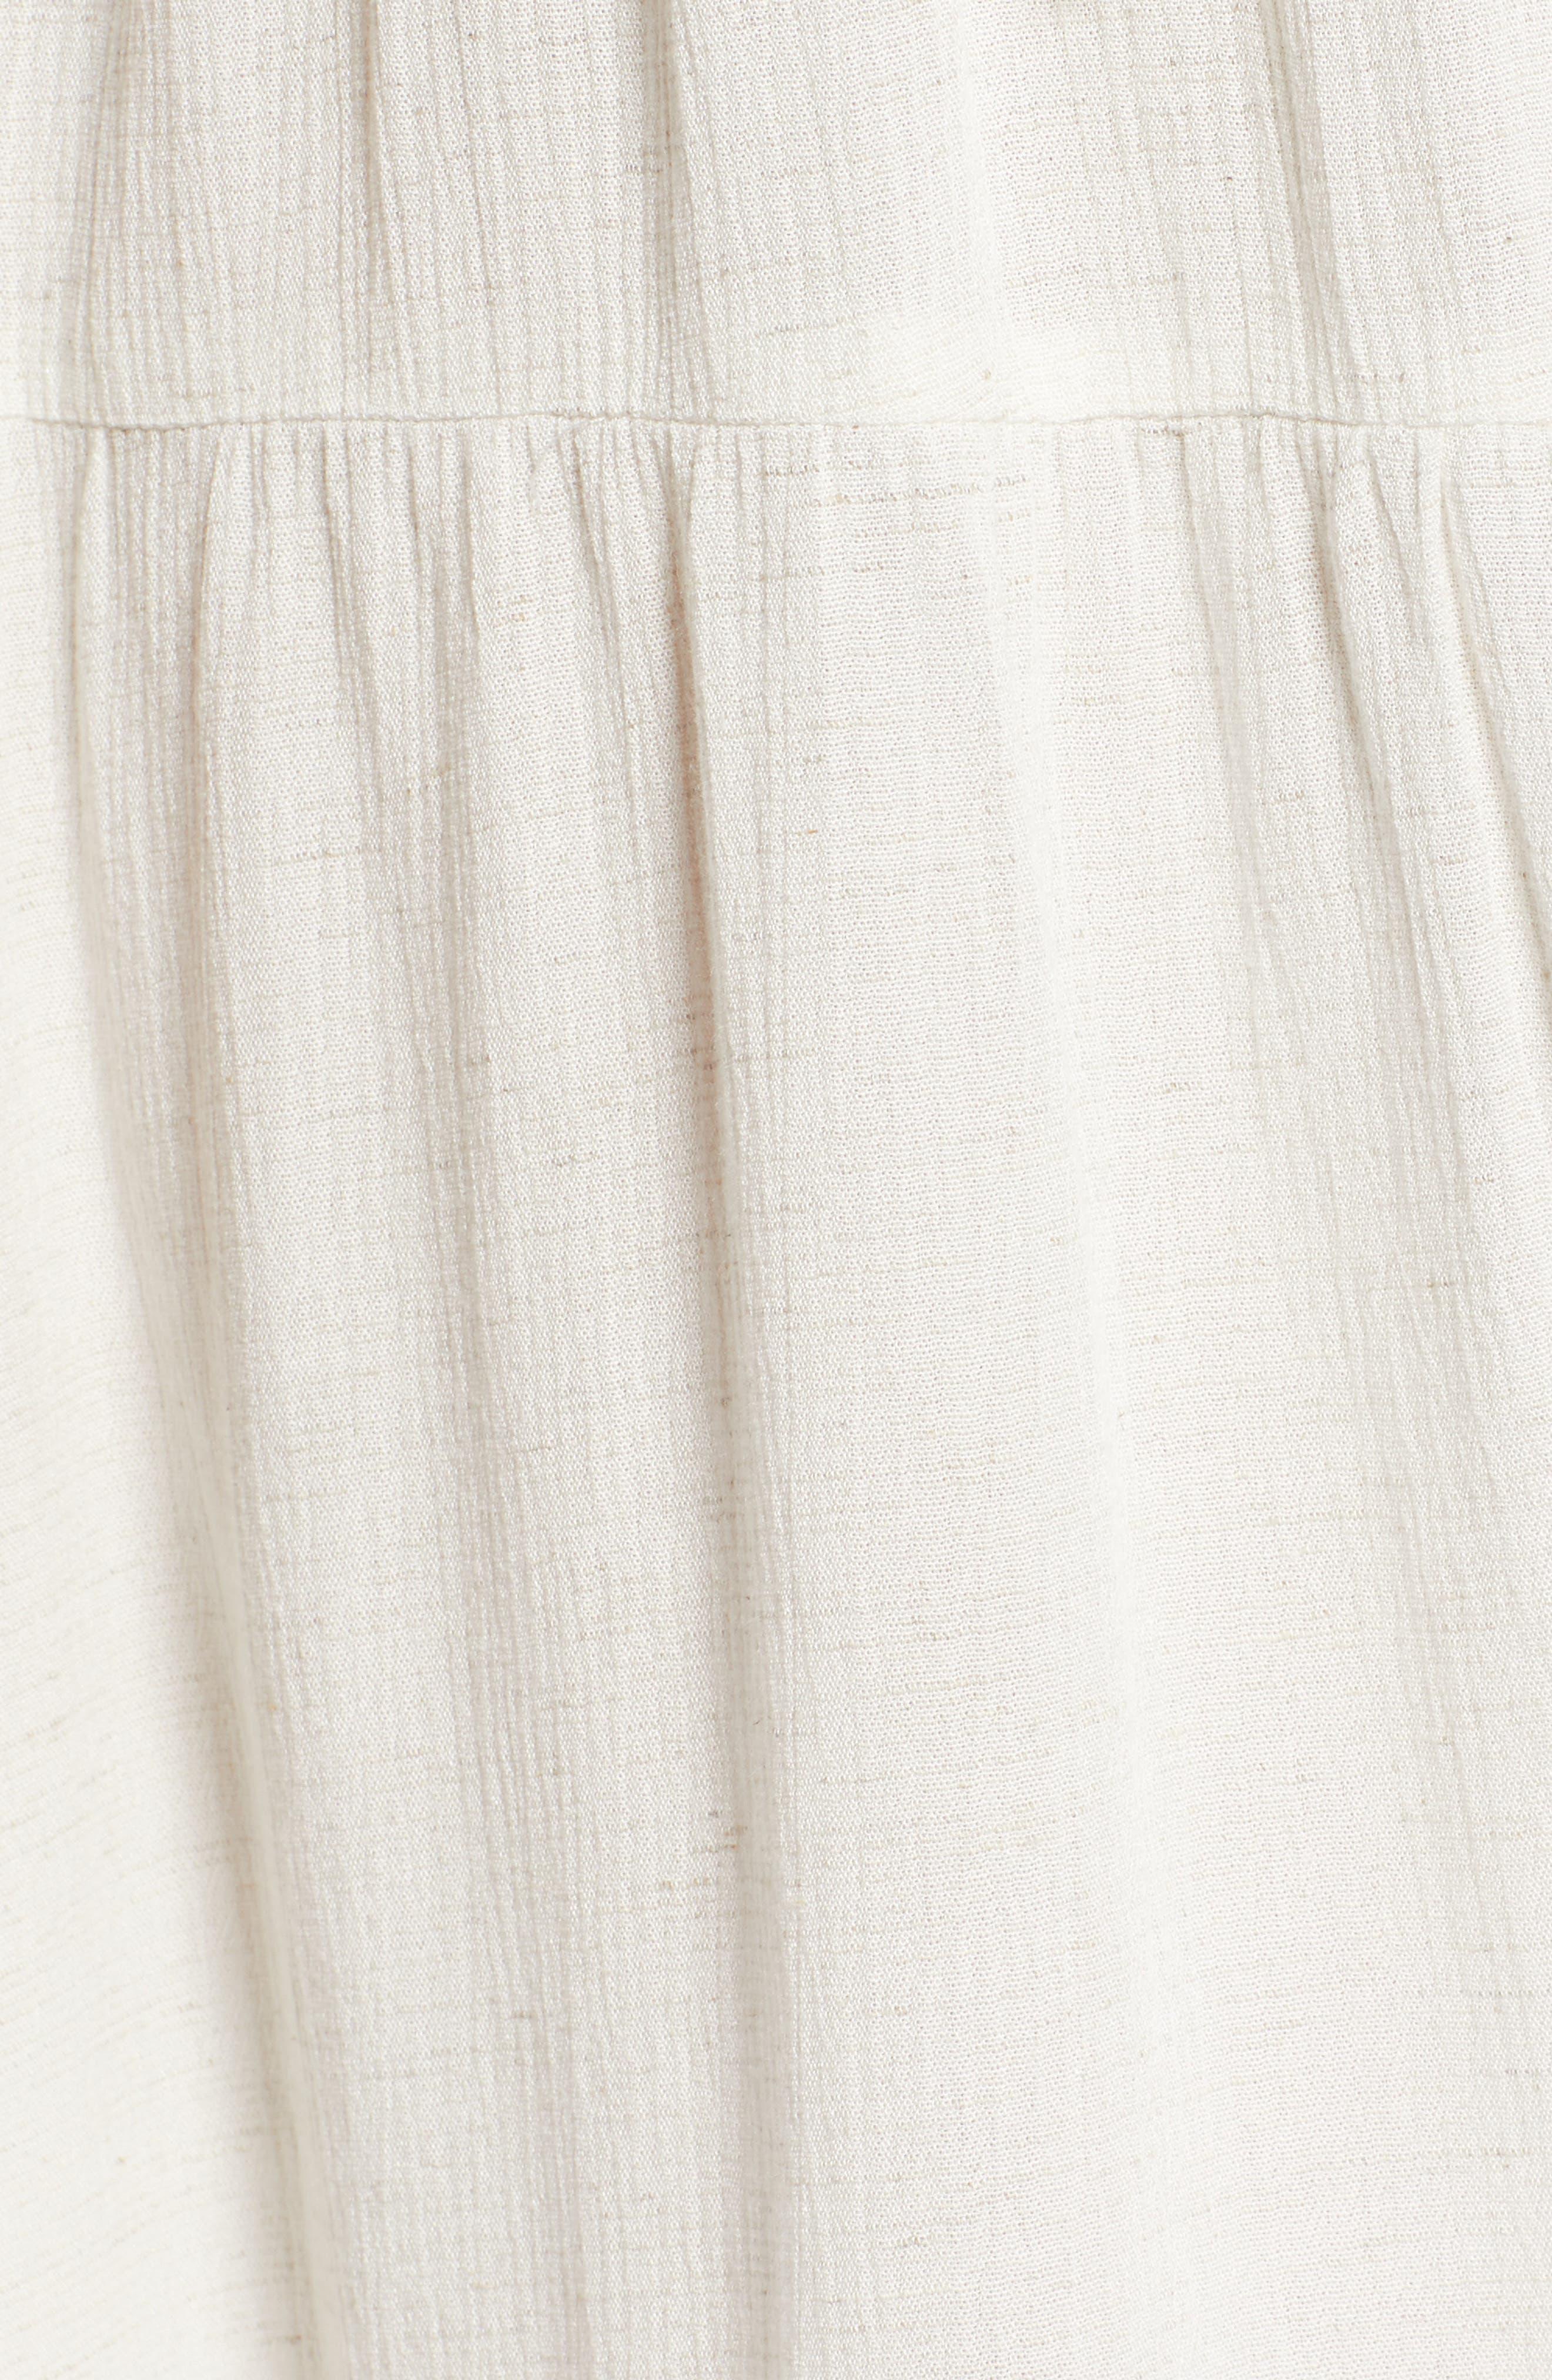 Rickrack Lace-Up Gauze Dress,                             Alternate thumbnail 6, color,                             101